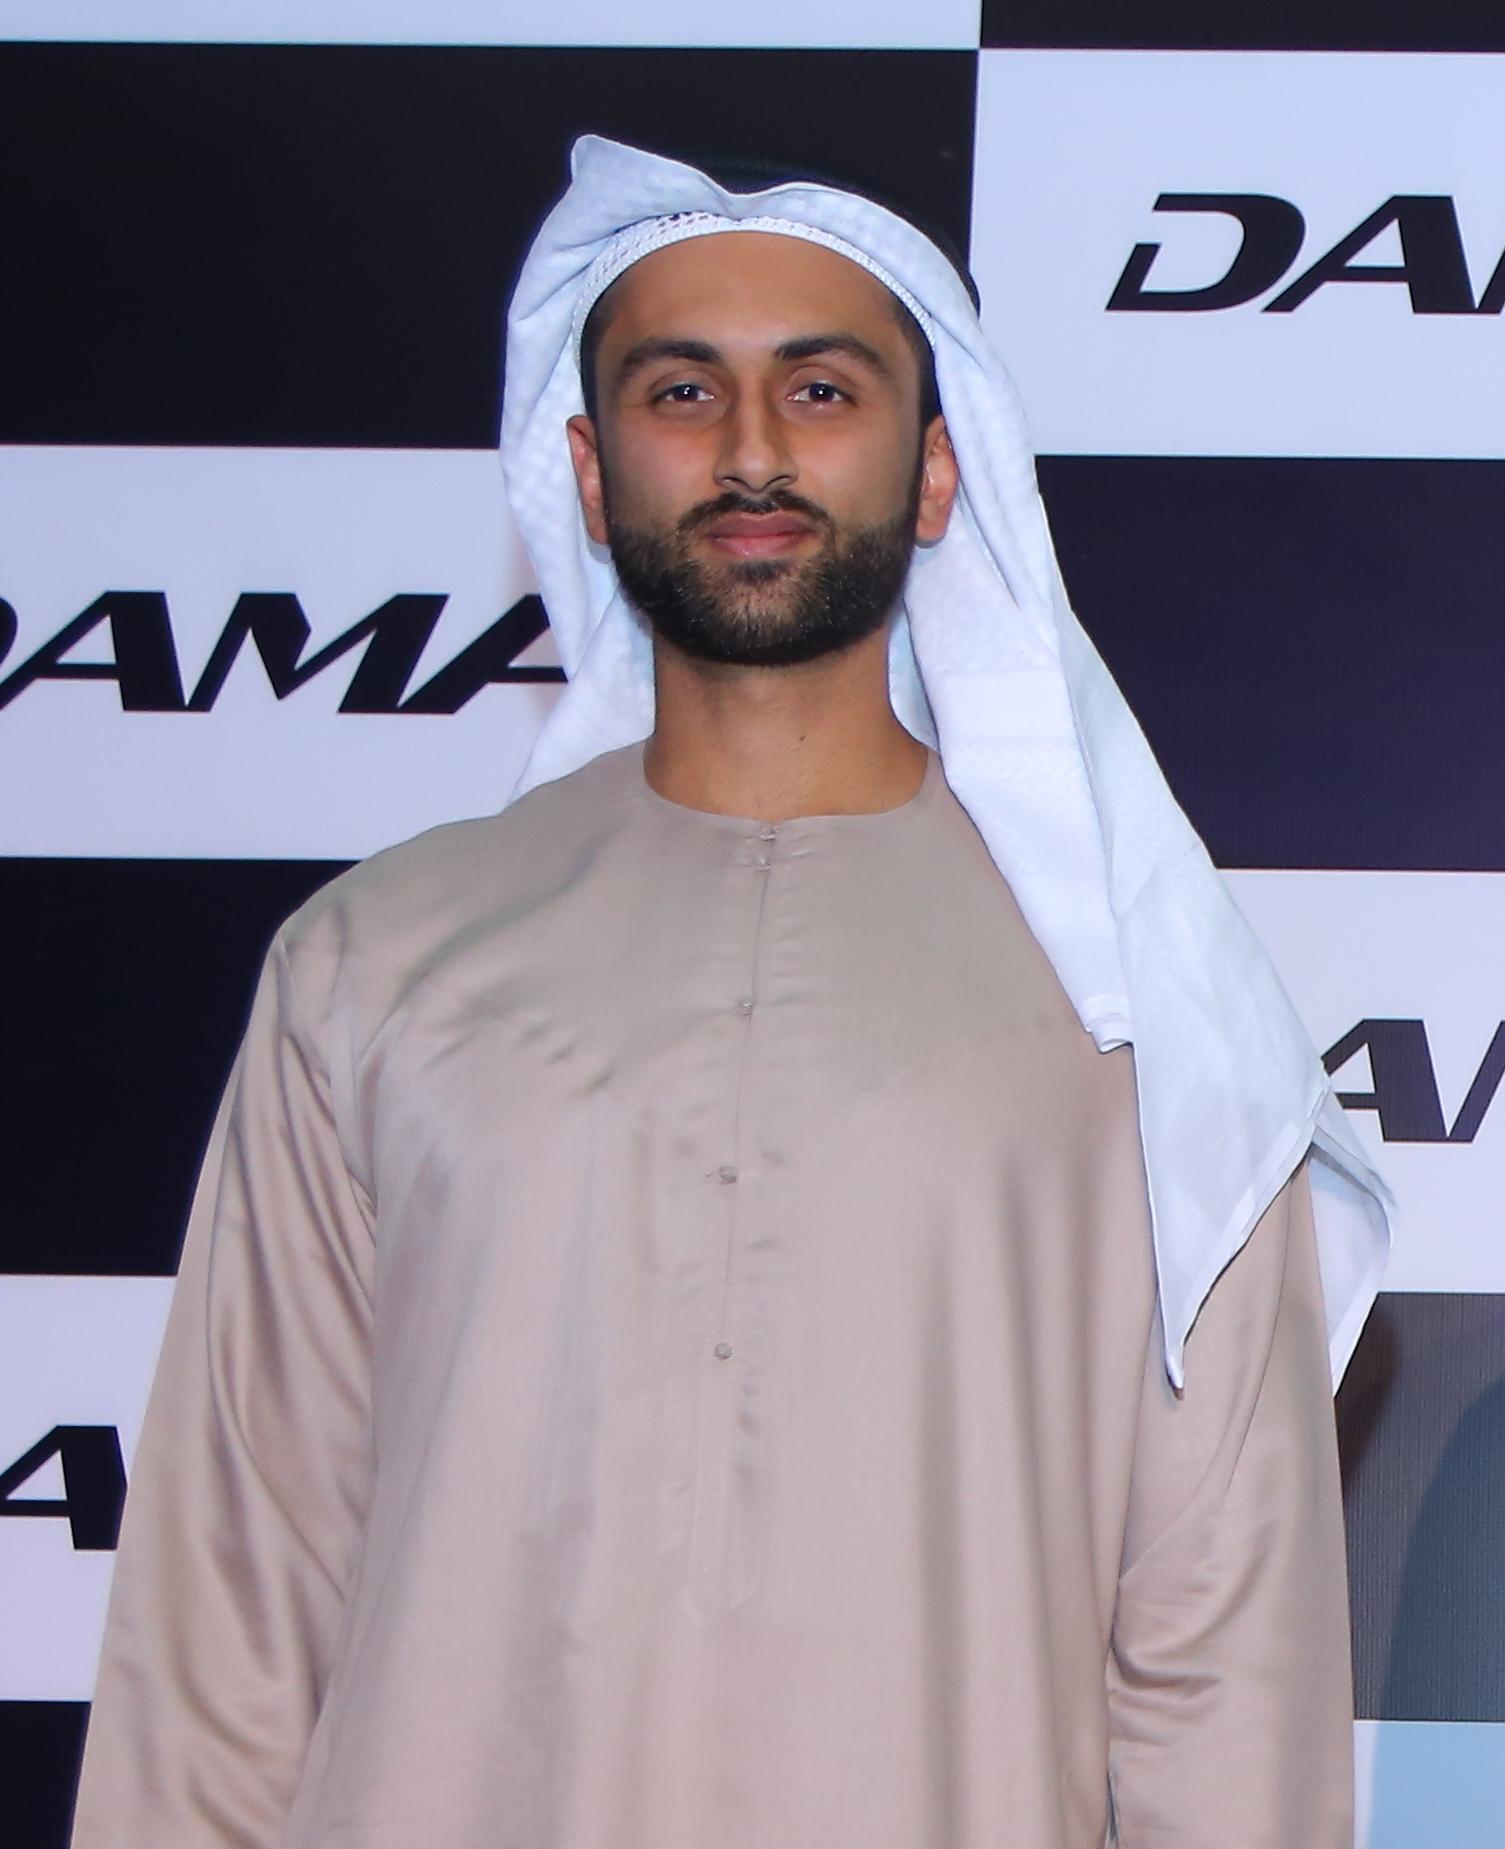 #28: Ali Sajwani, DAMAC Properties